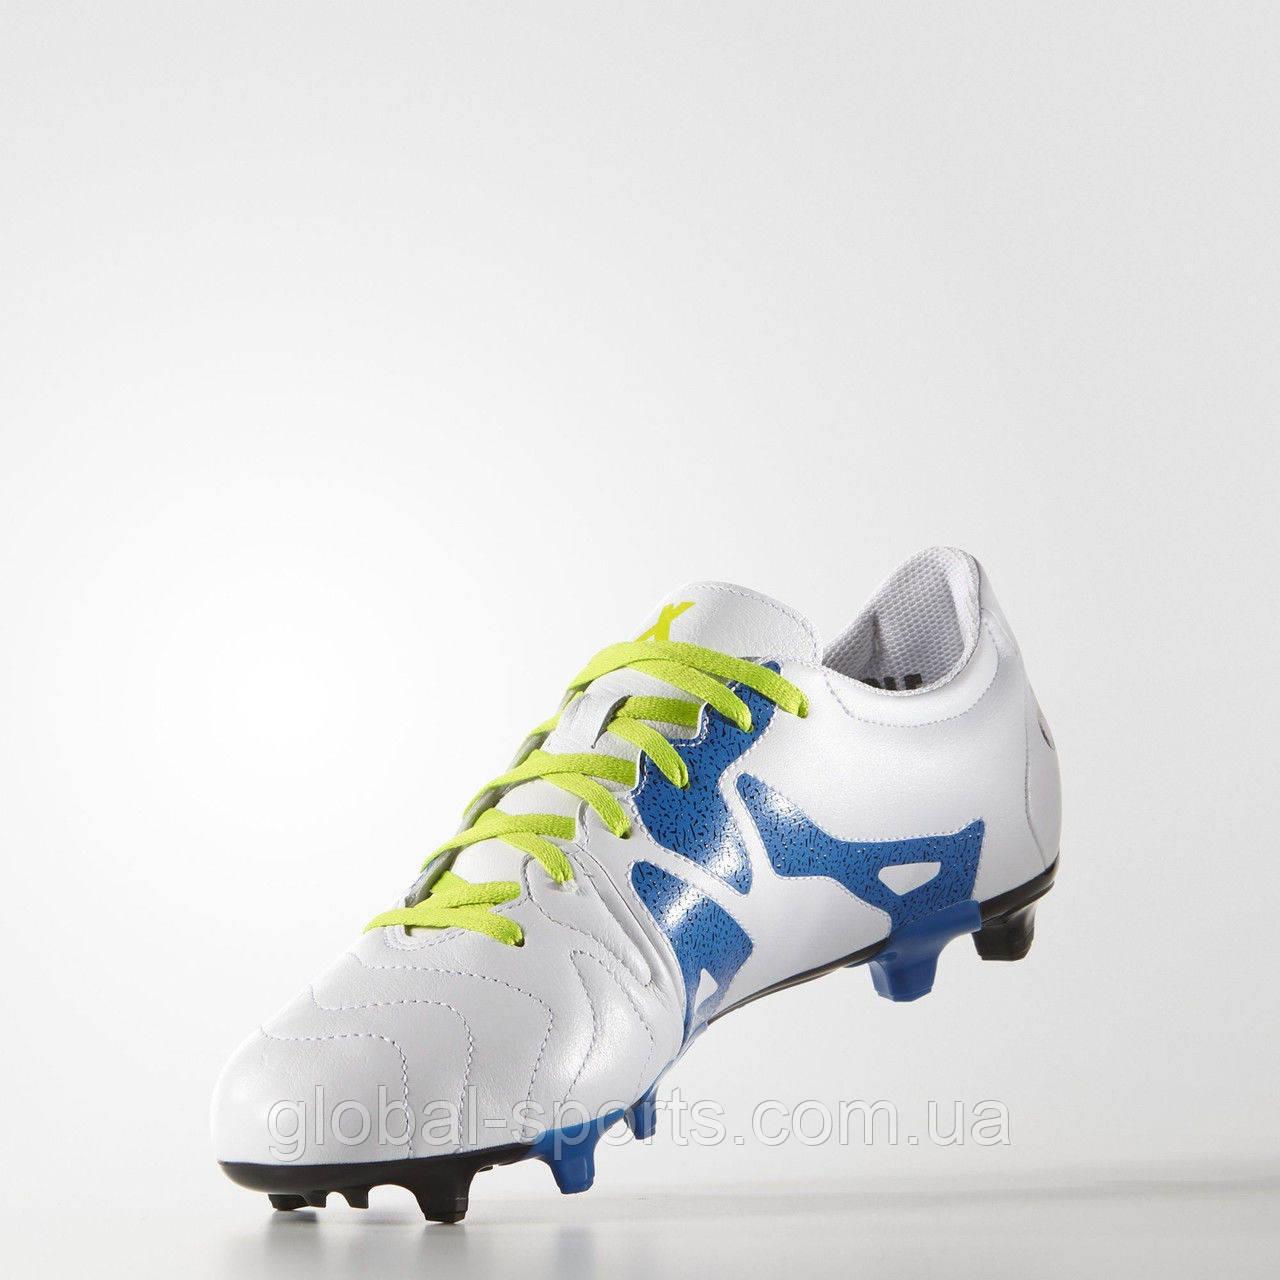 0758adcd Футбольные бутсы Adidas X 15.3 FG/AG Leather (Артикул: S74641) - магазин